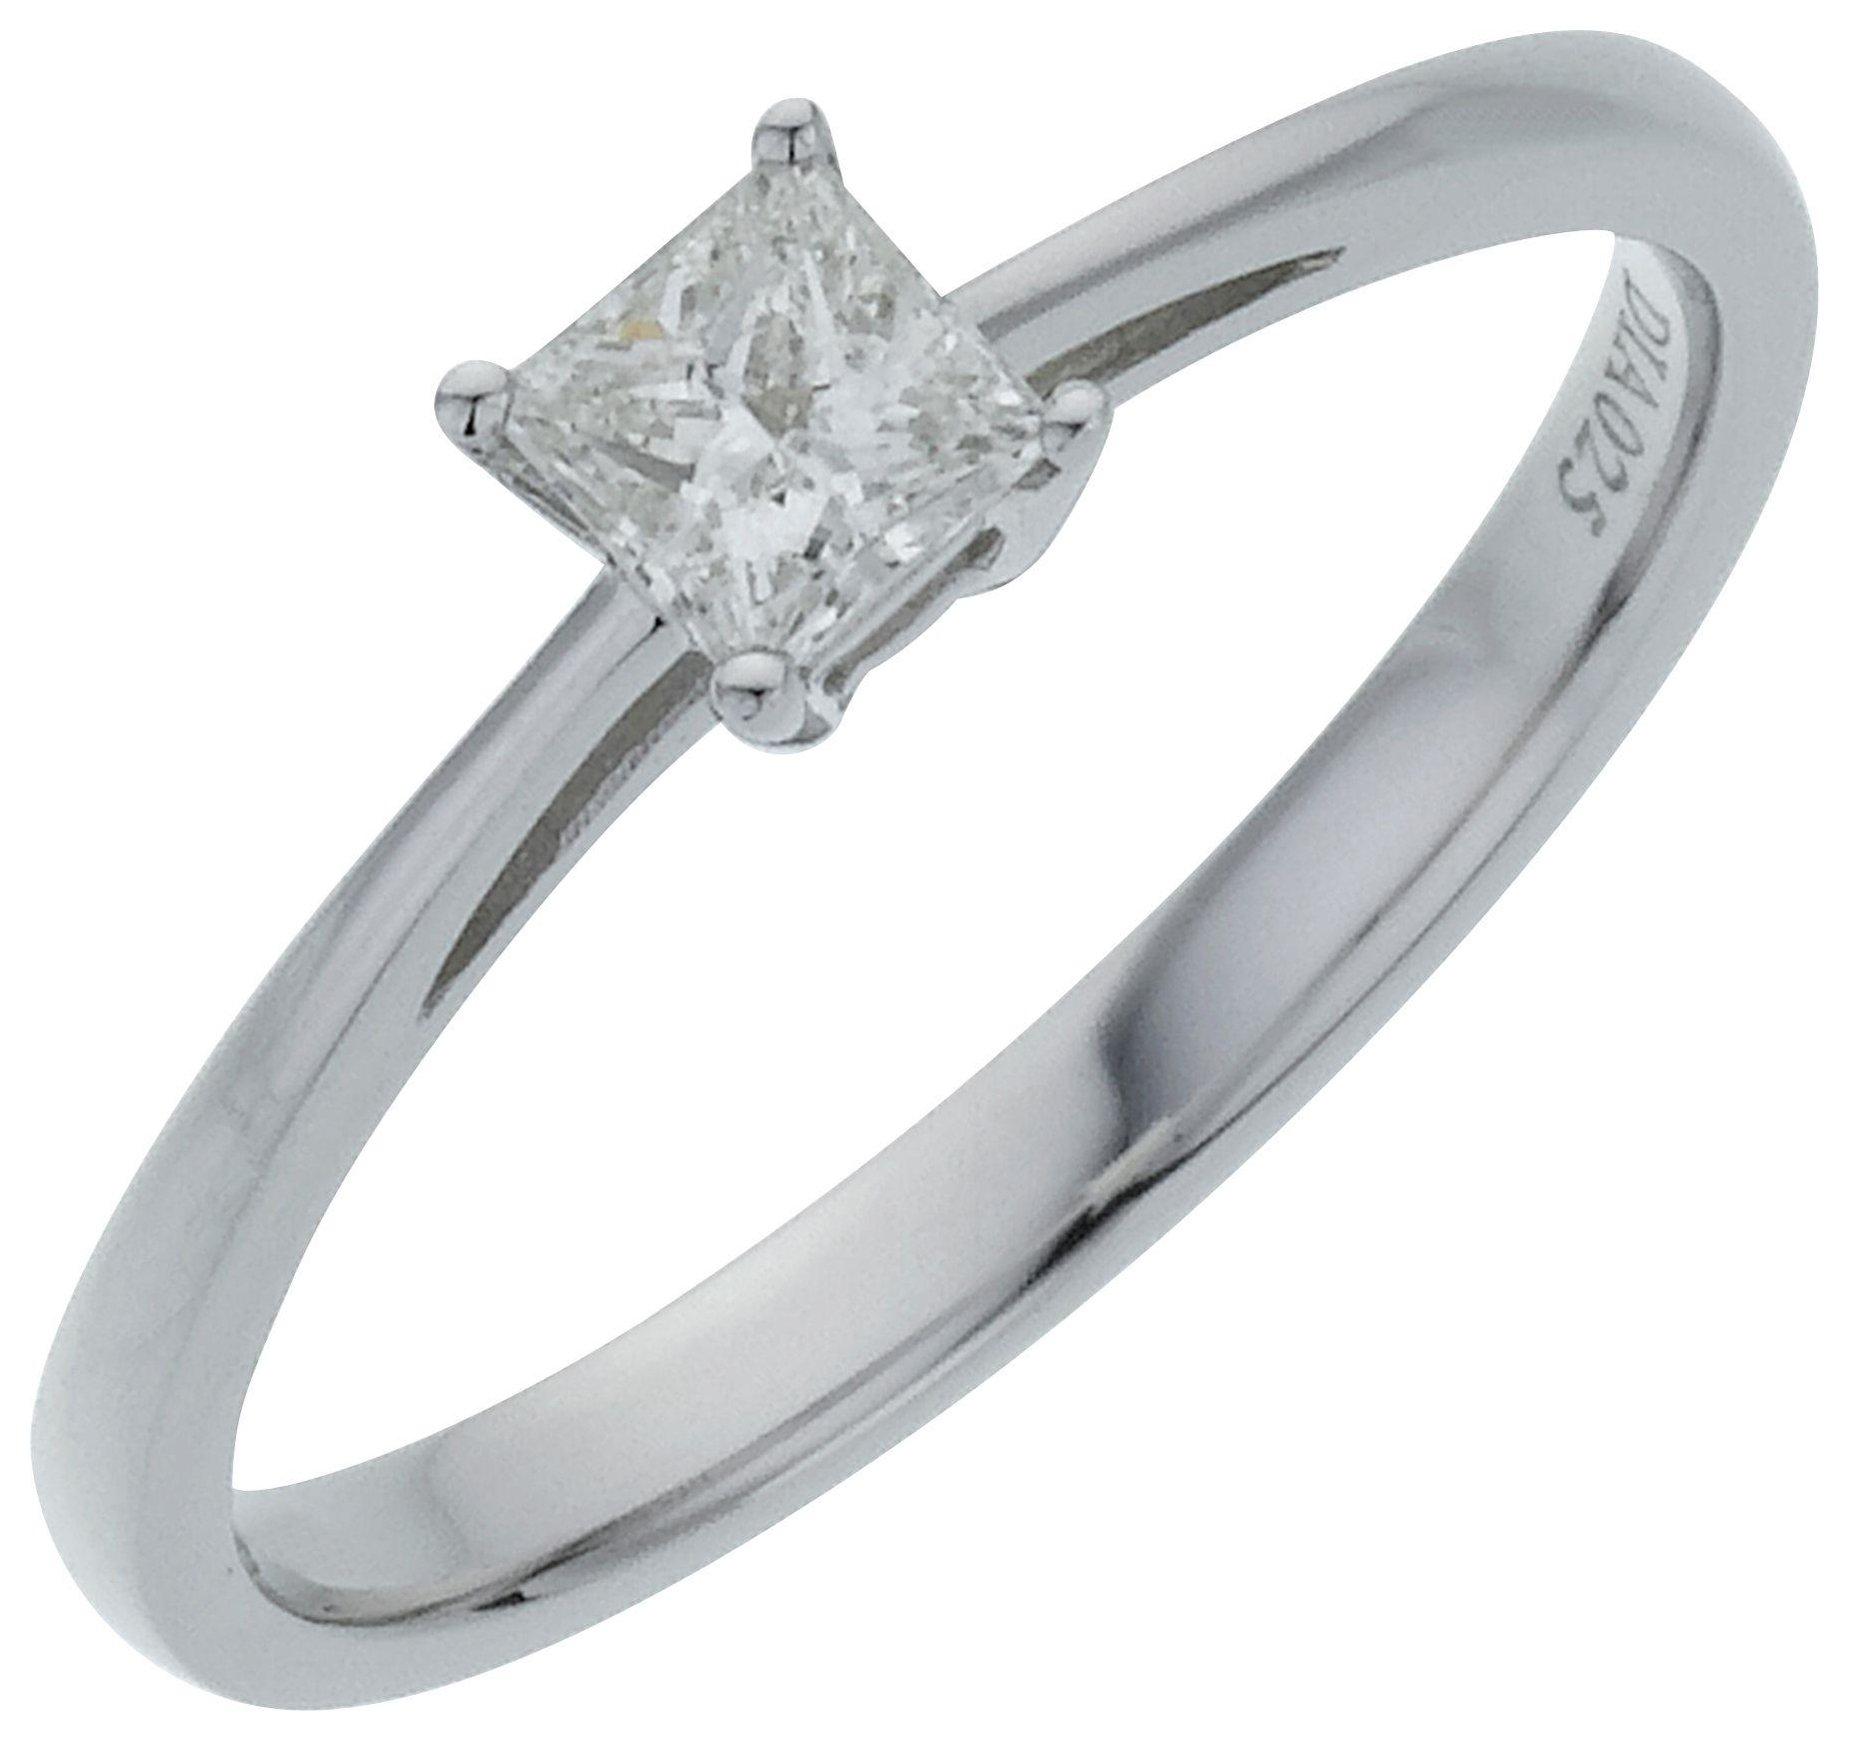 18 Carat White Gold 025 Carat Diamond - Princess Cut Diamond - Ring - U